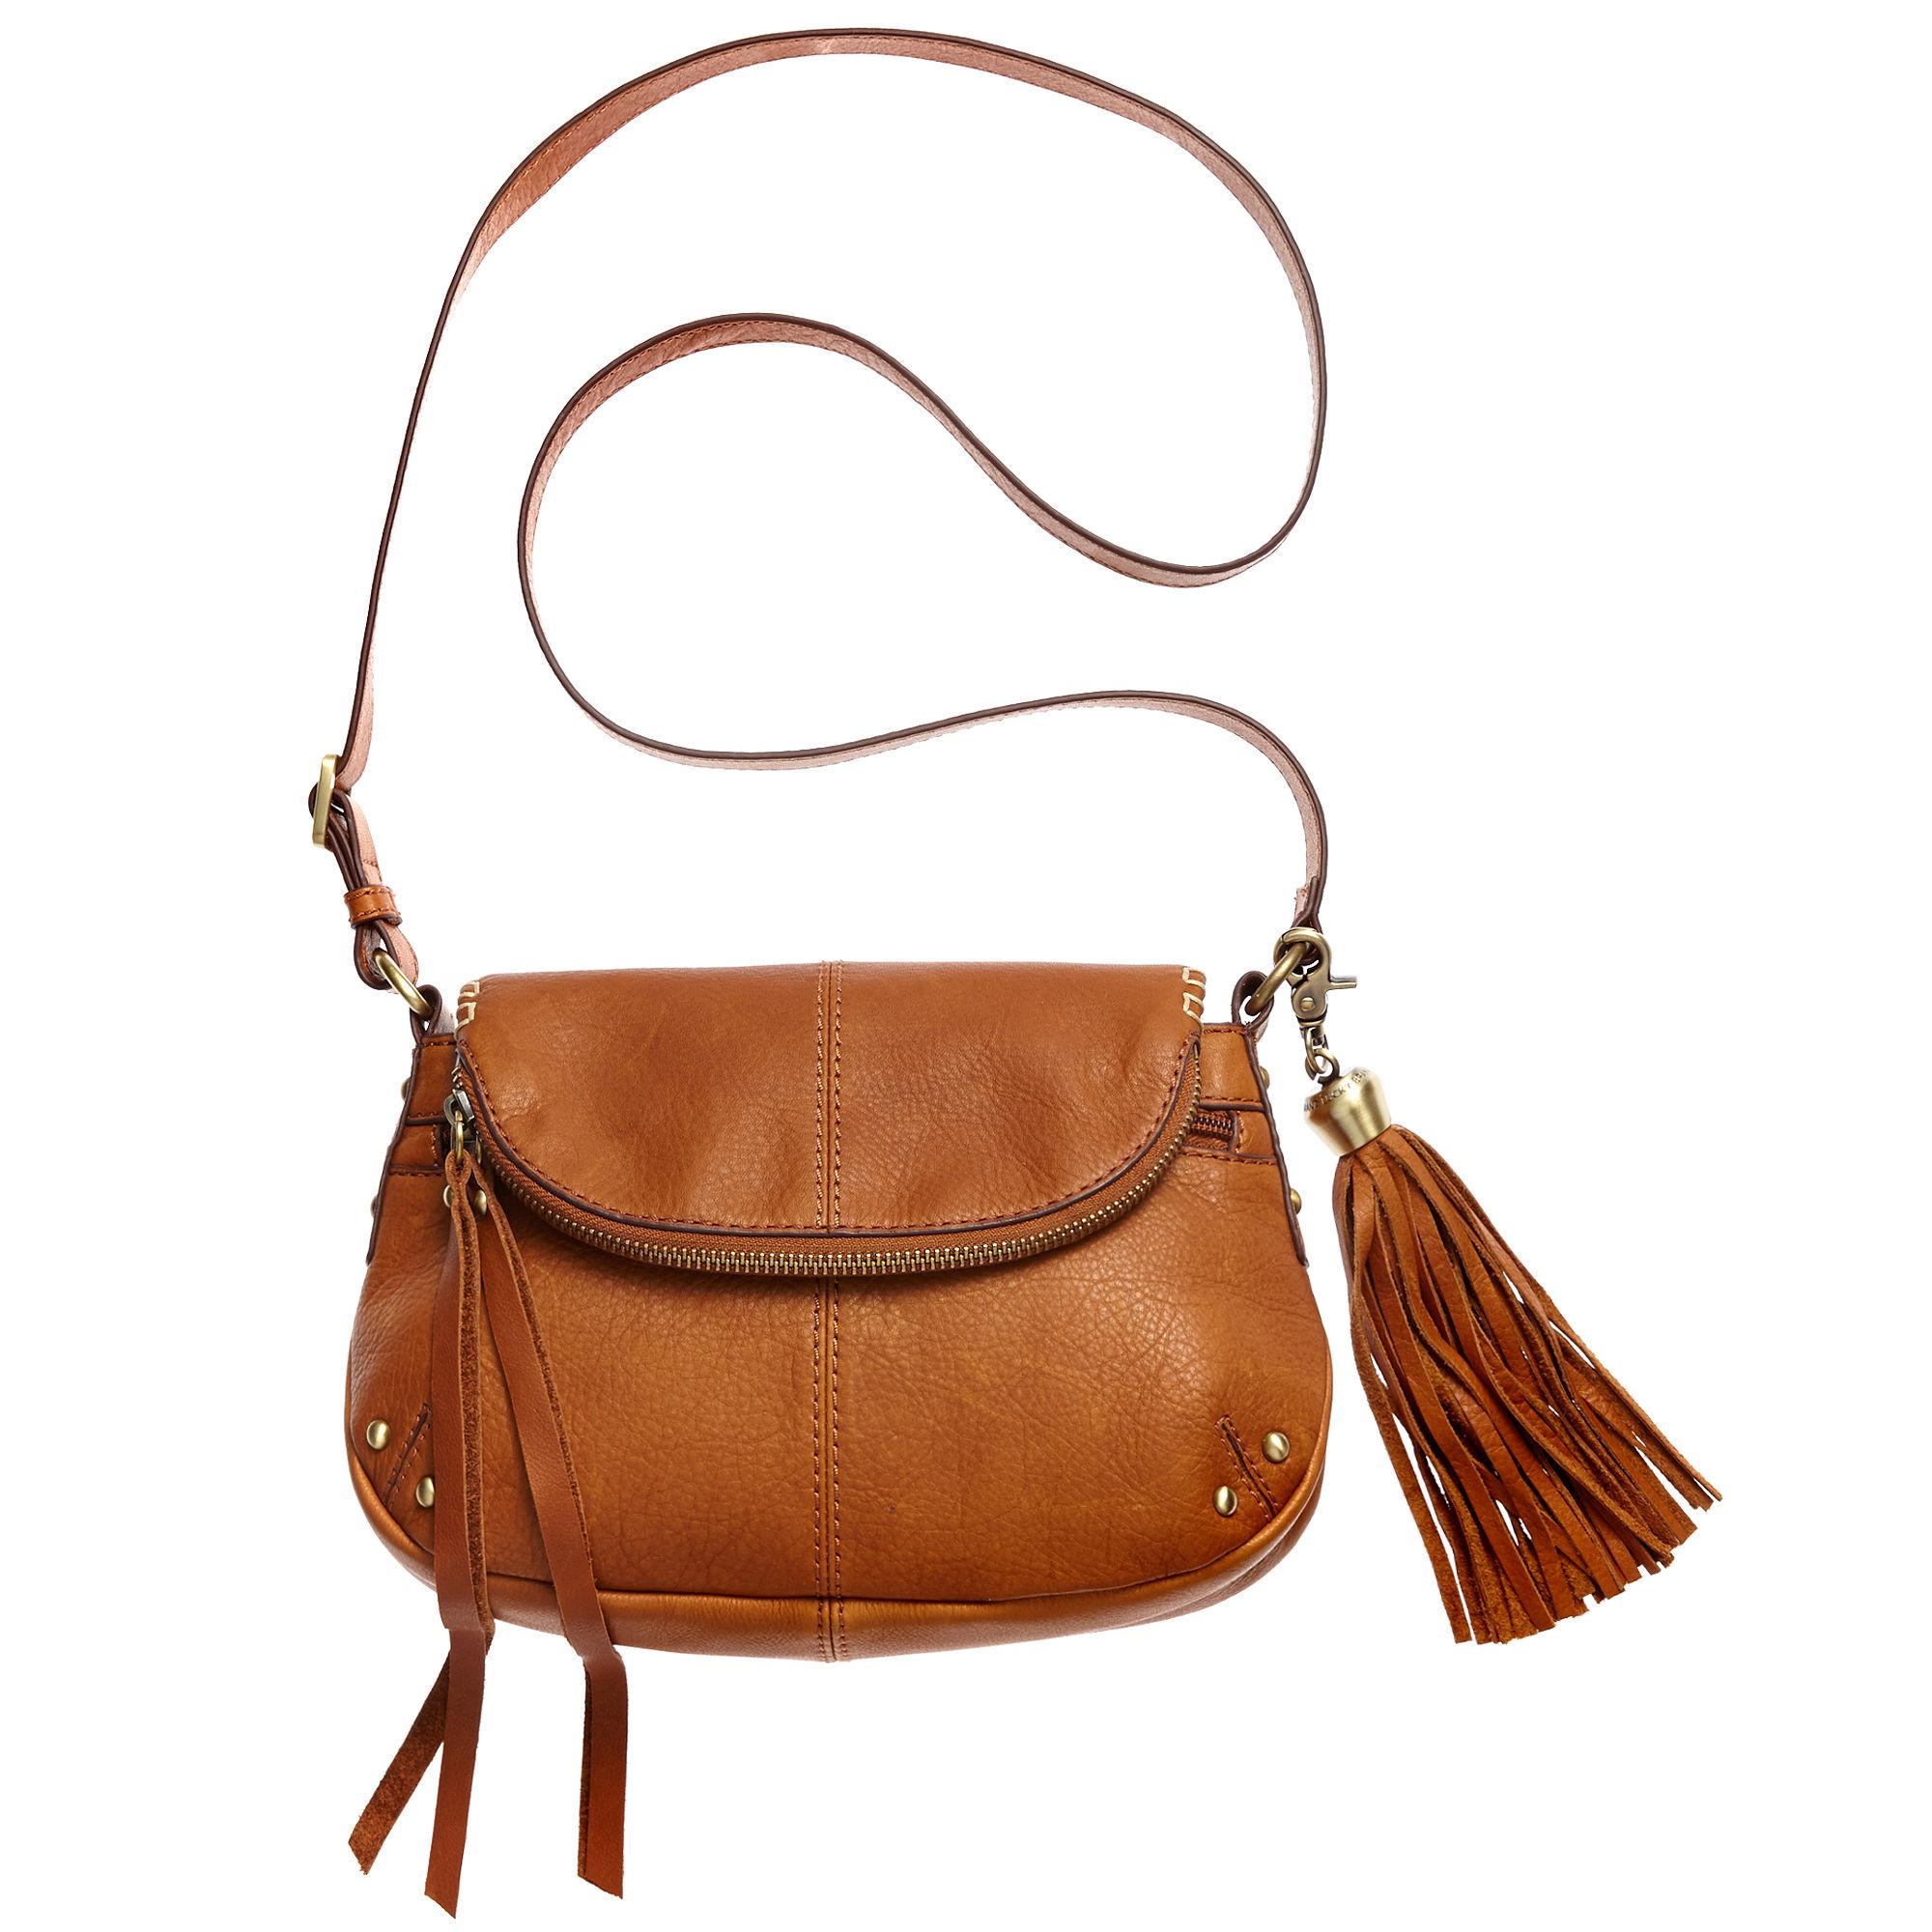 f4946a2b1cec Lucky Brand Handbag - Foto Handbag All Collections Salonagafiya.Com